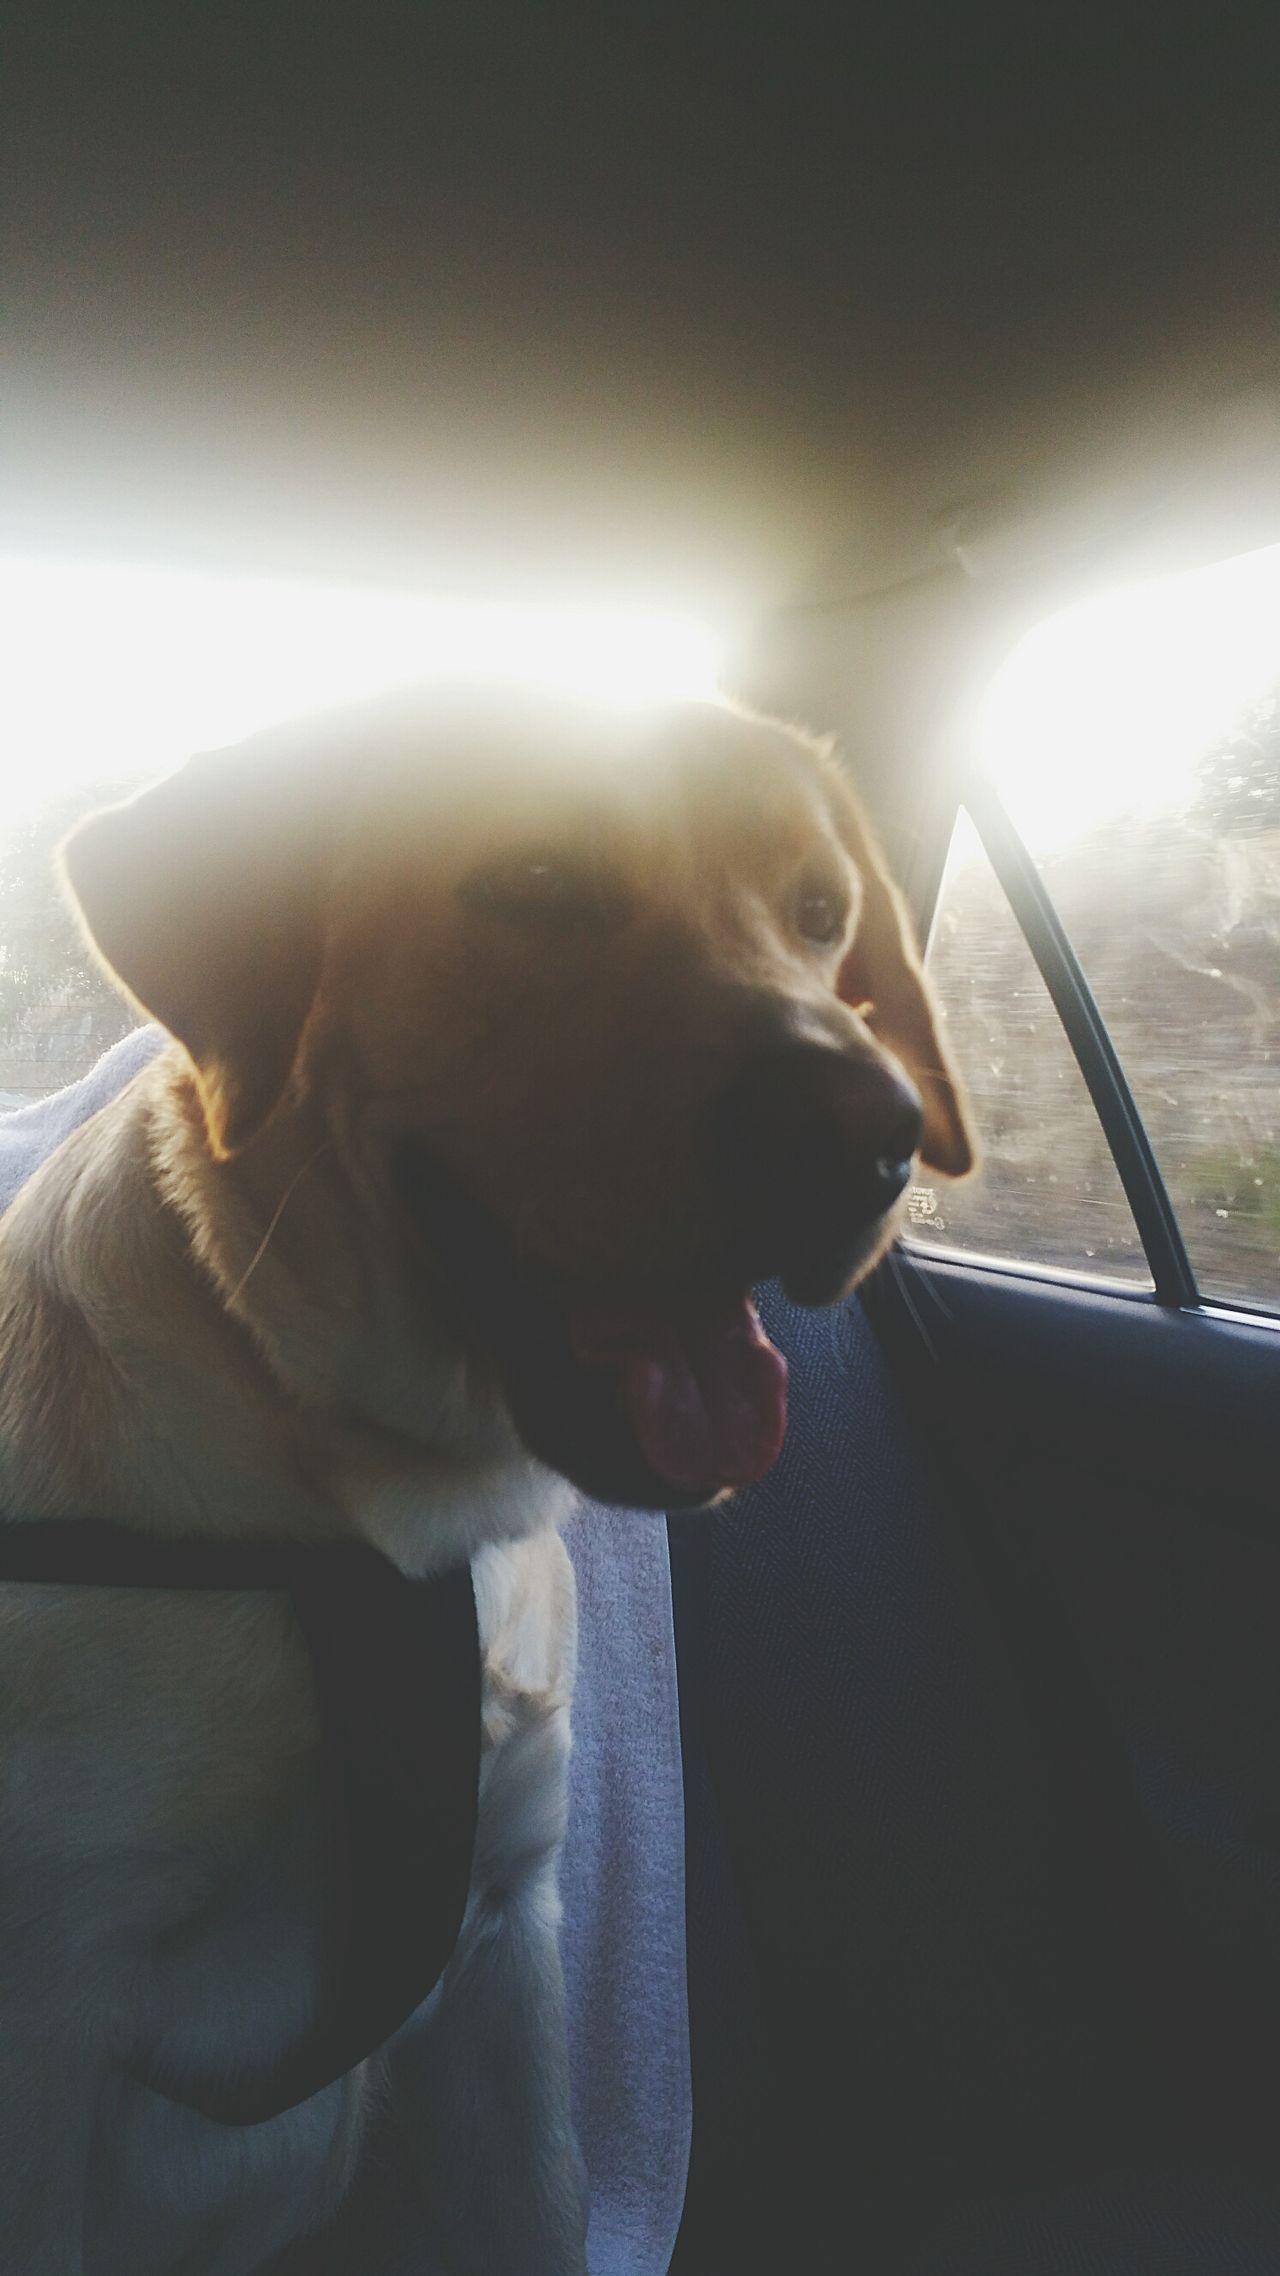 My true love 💕 Road Trip Sunset Love Of My Life Best Friend Simba Labrador Best Friends Dog Cumplicity